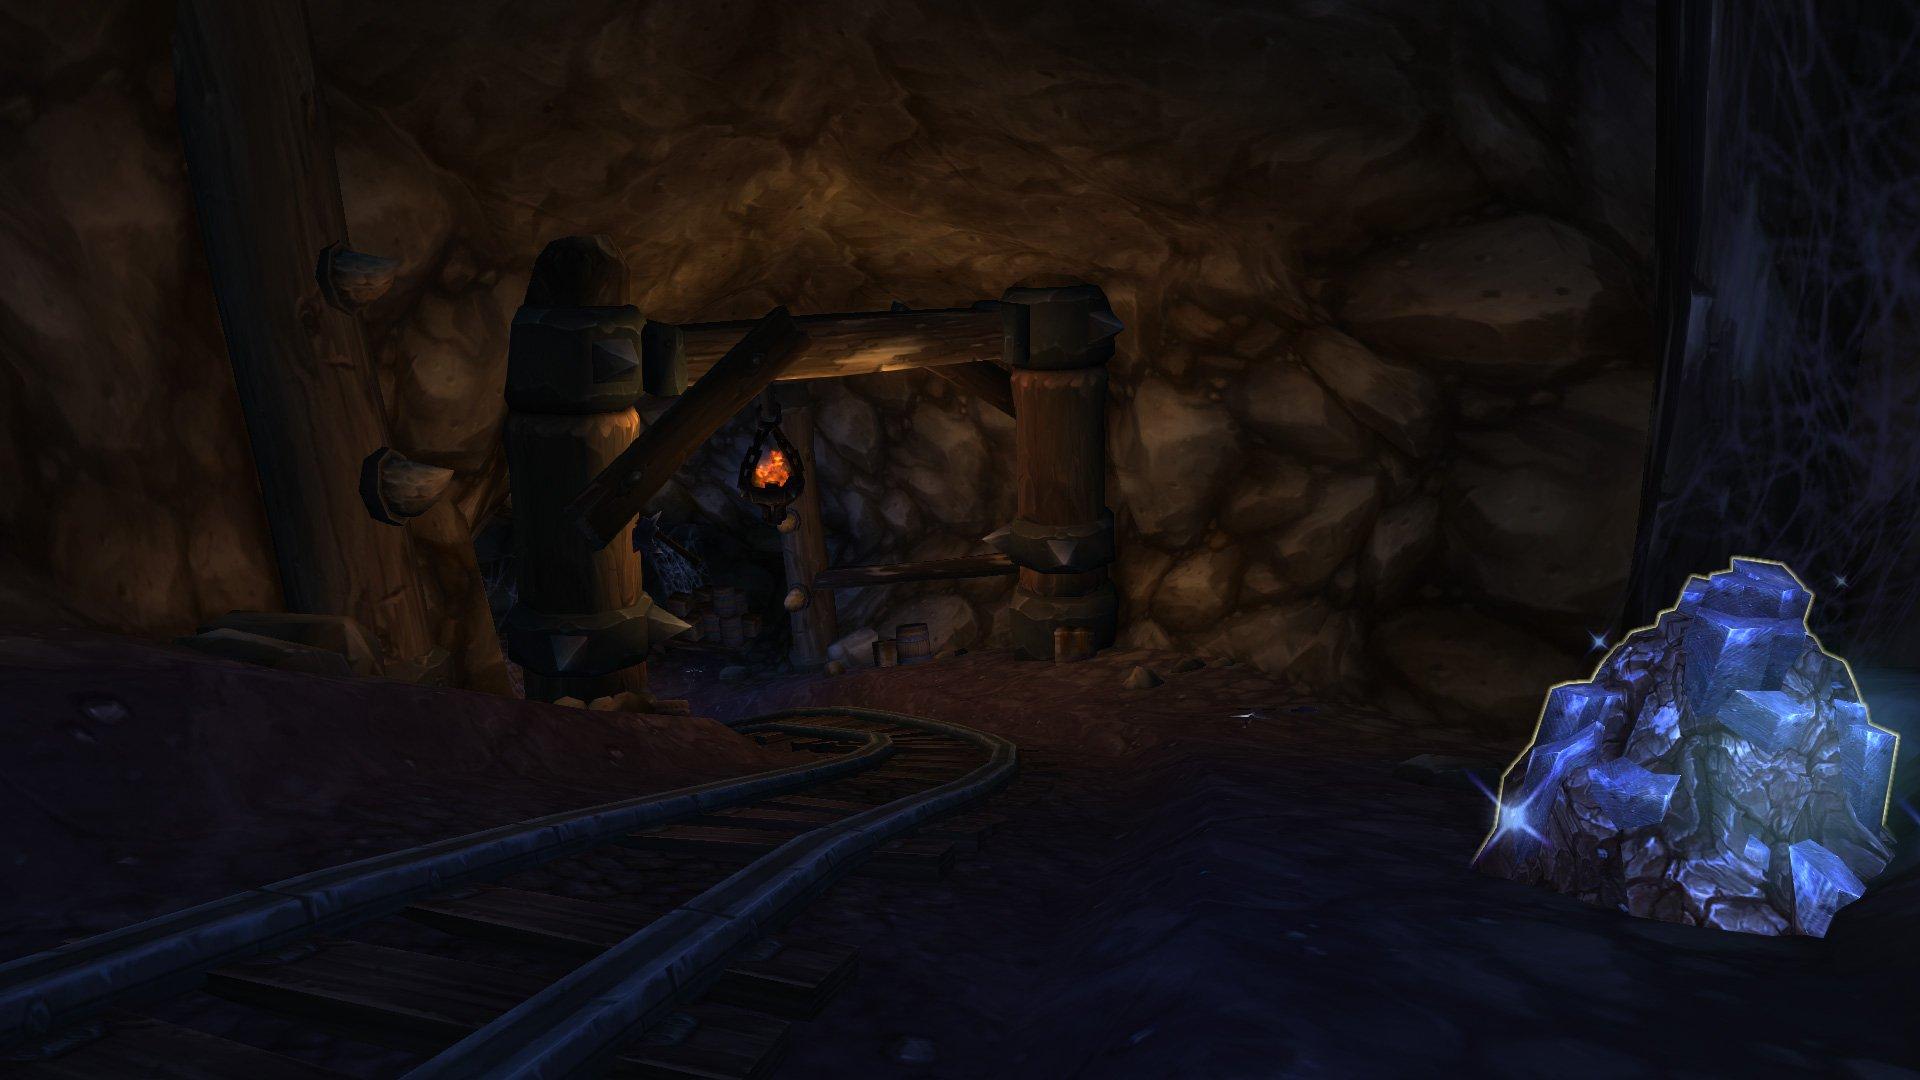 Warlords of draenor garrisons lunarfall excavation frostwall level 2 screenshots malvernweather Choice Image